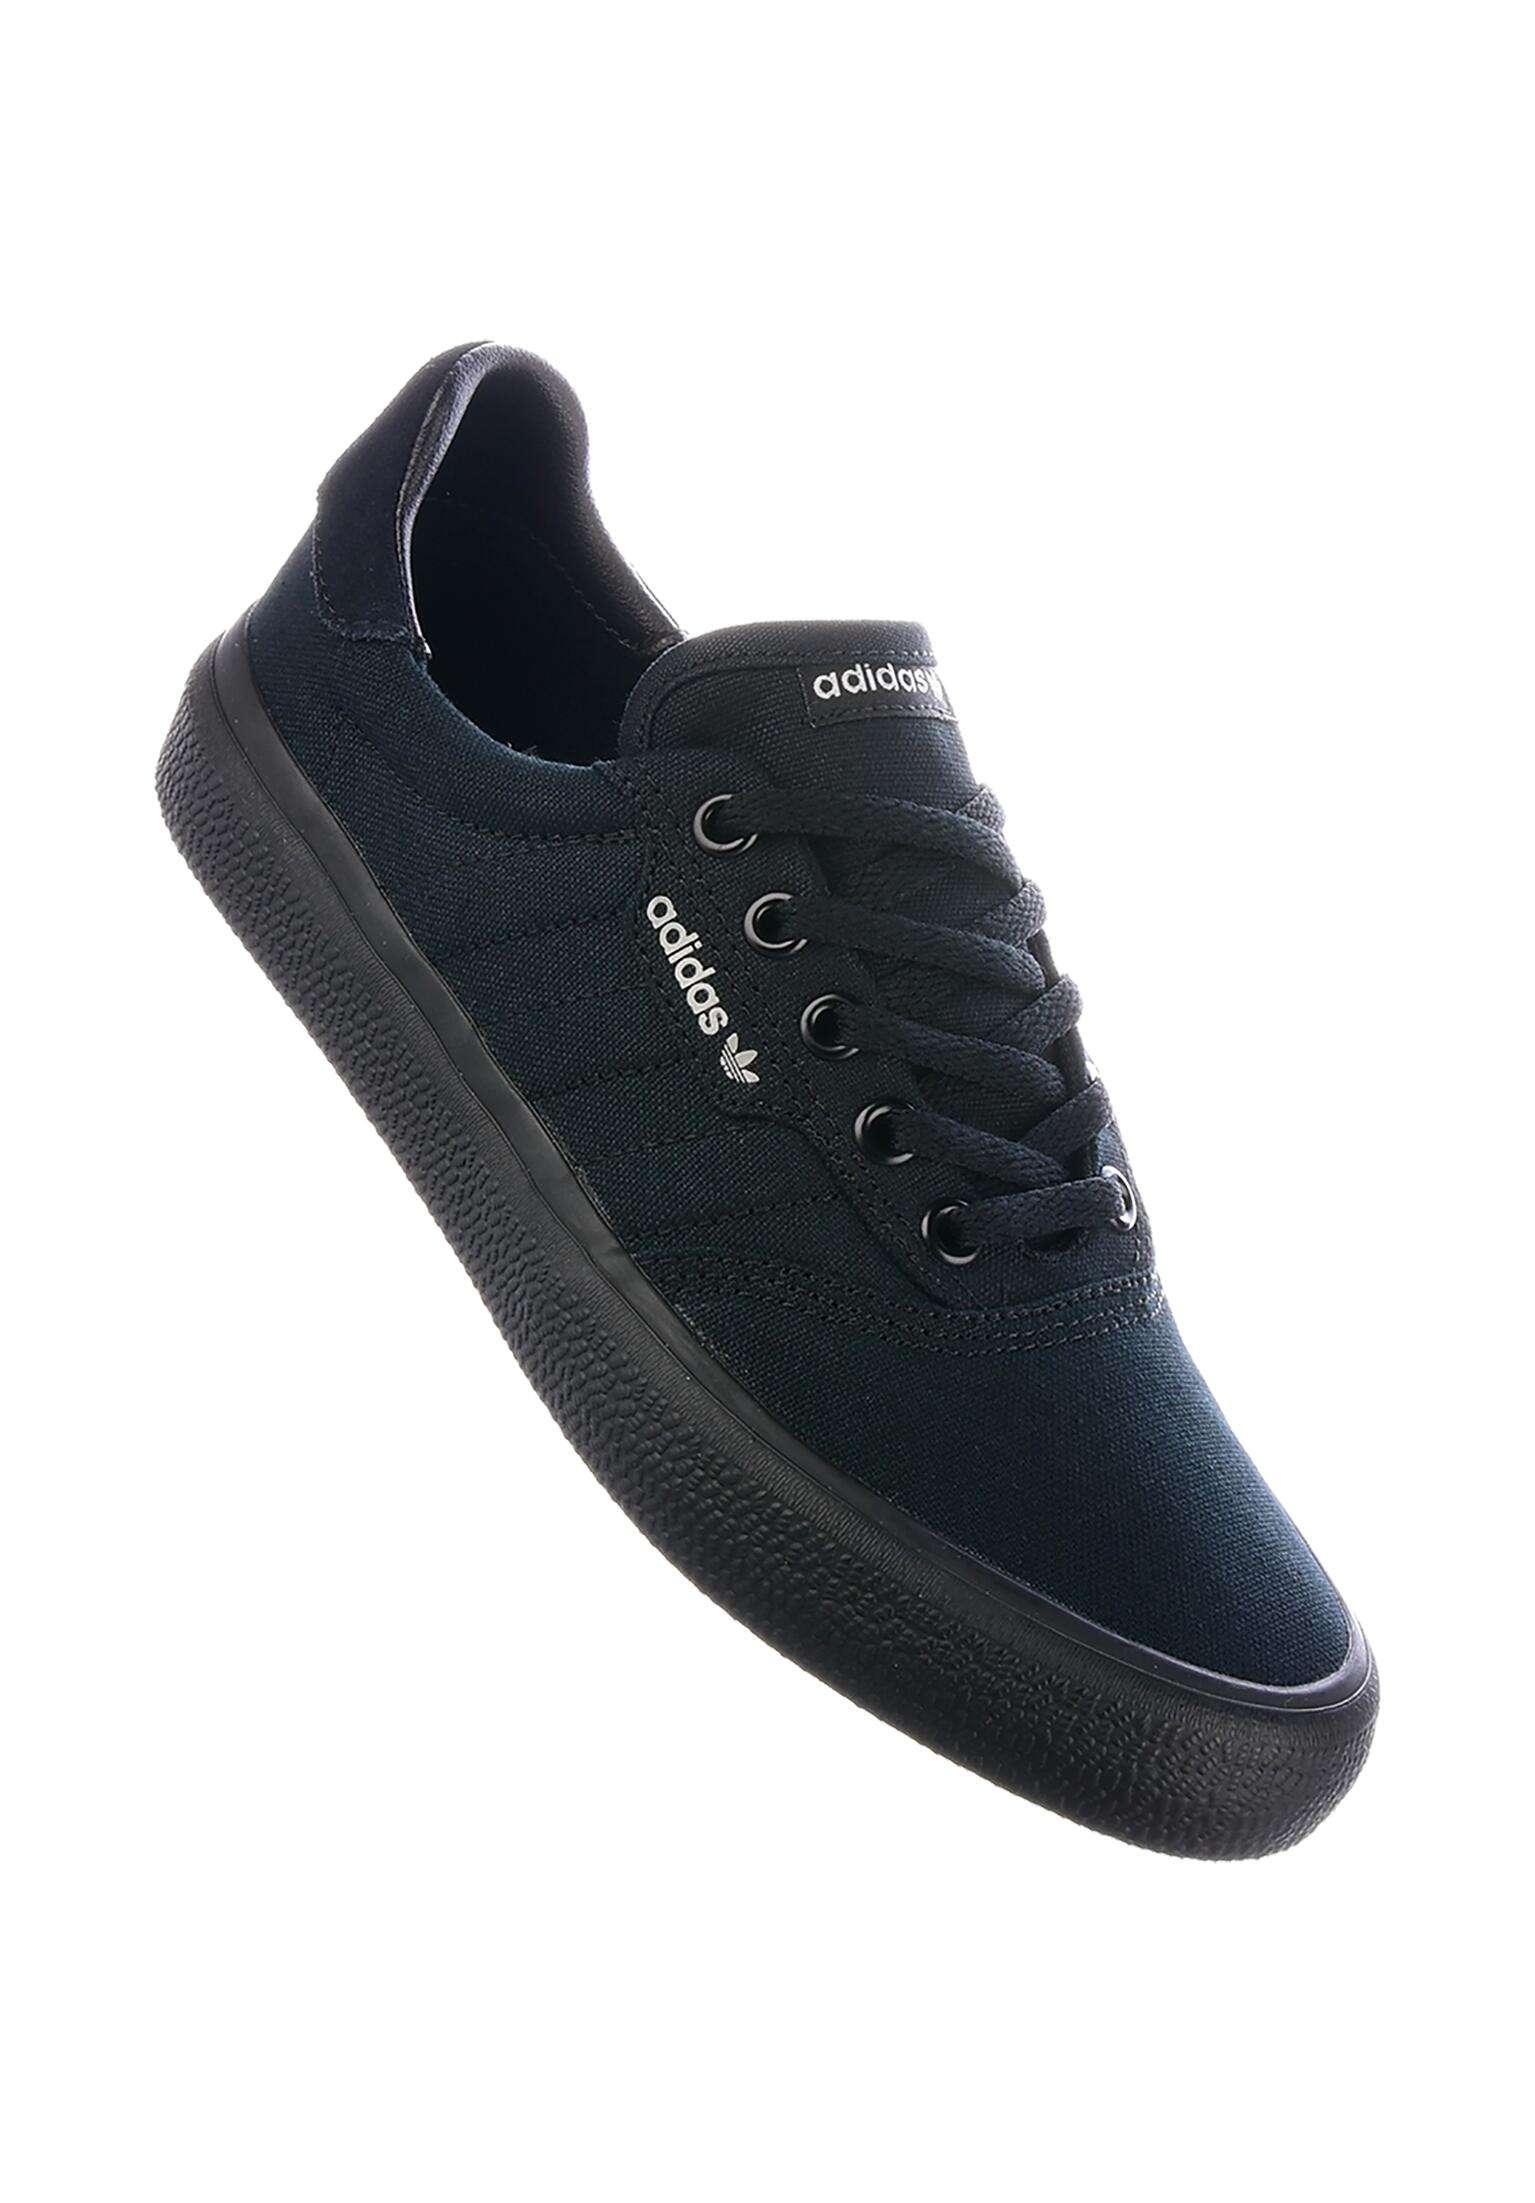 9d393a1d1edd55 3MC adidas All Shoes in coreblack-coreblack-greytwo for Women